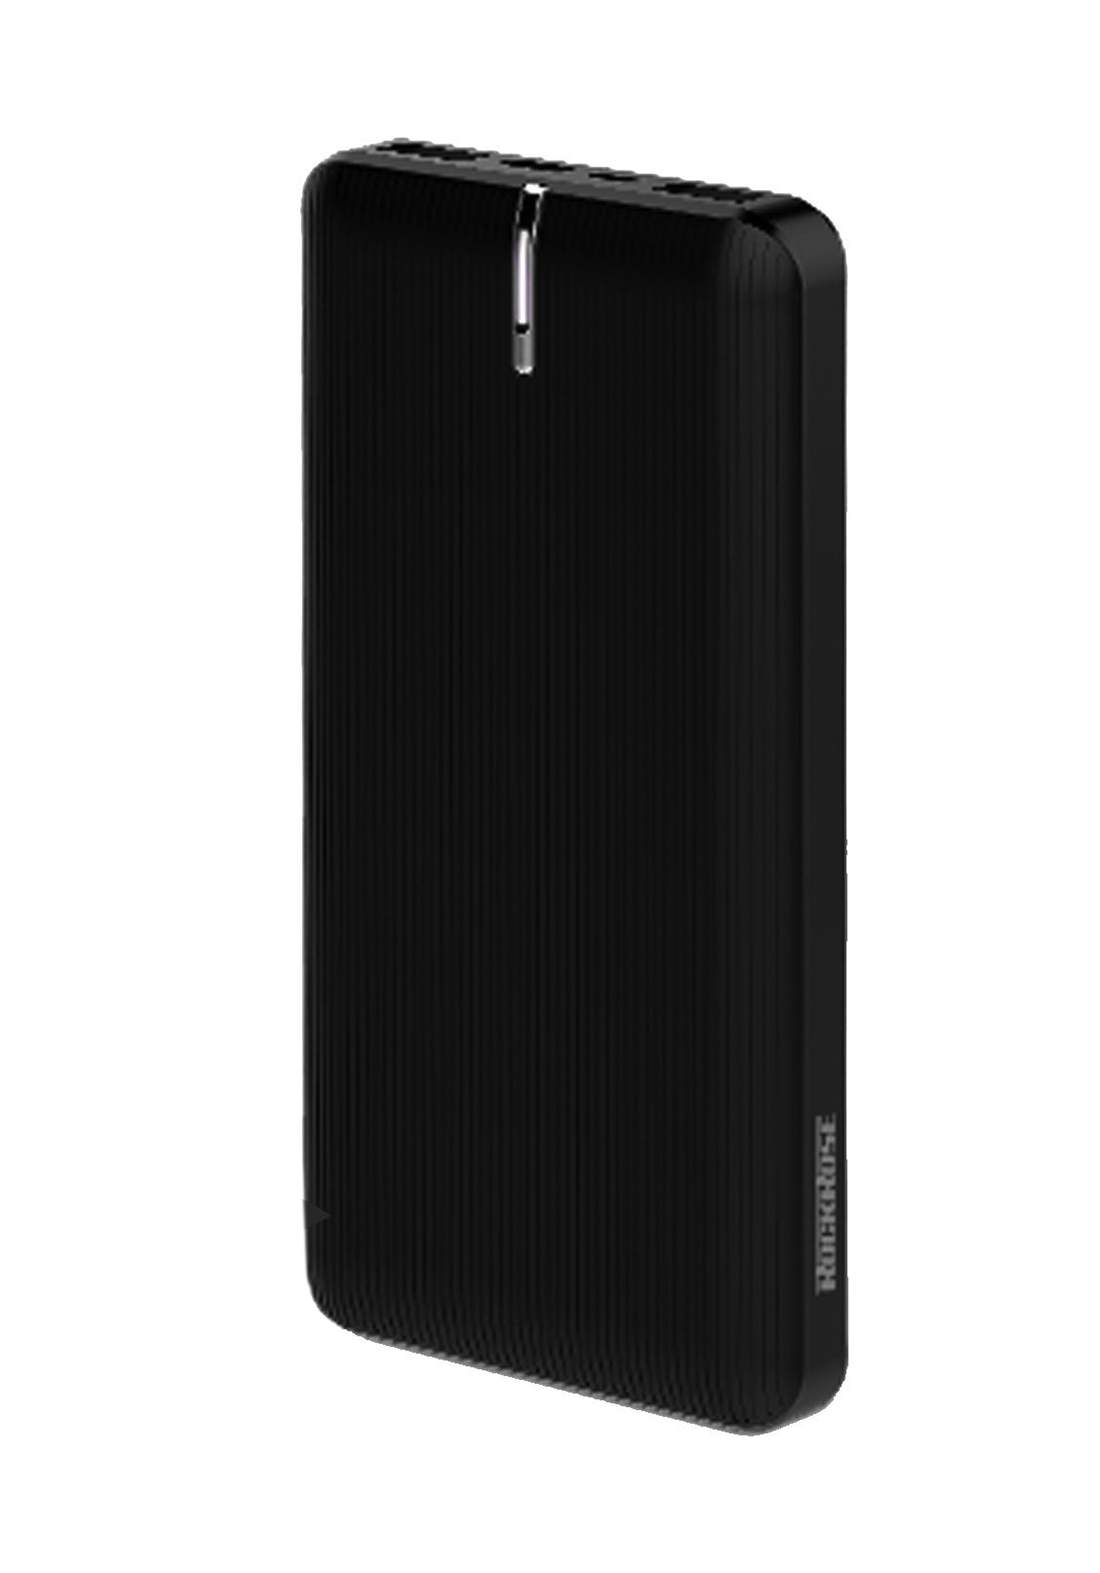 (4036)Rockrose Power Bank RRPB08B Vogue 10 Dual Port 10000mAh - Black